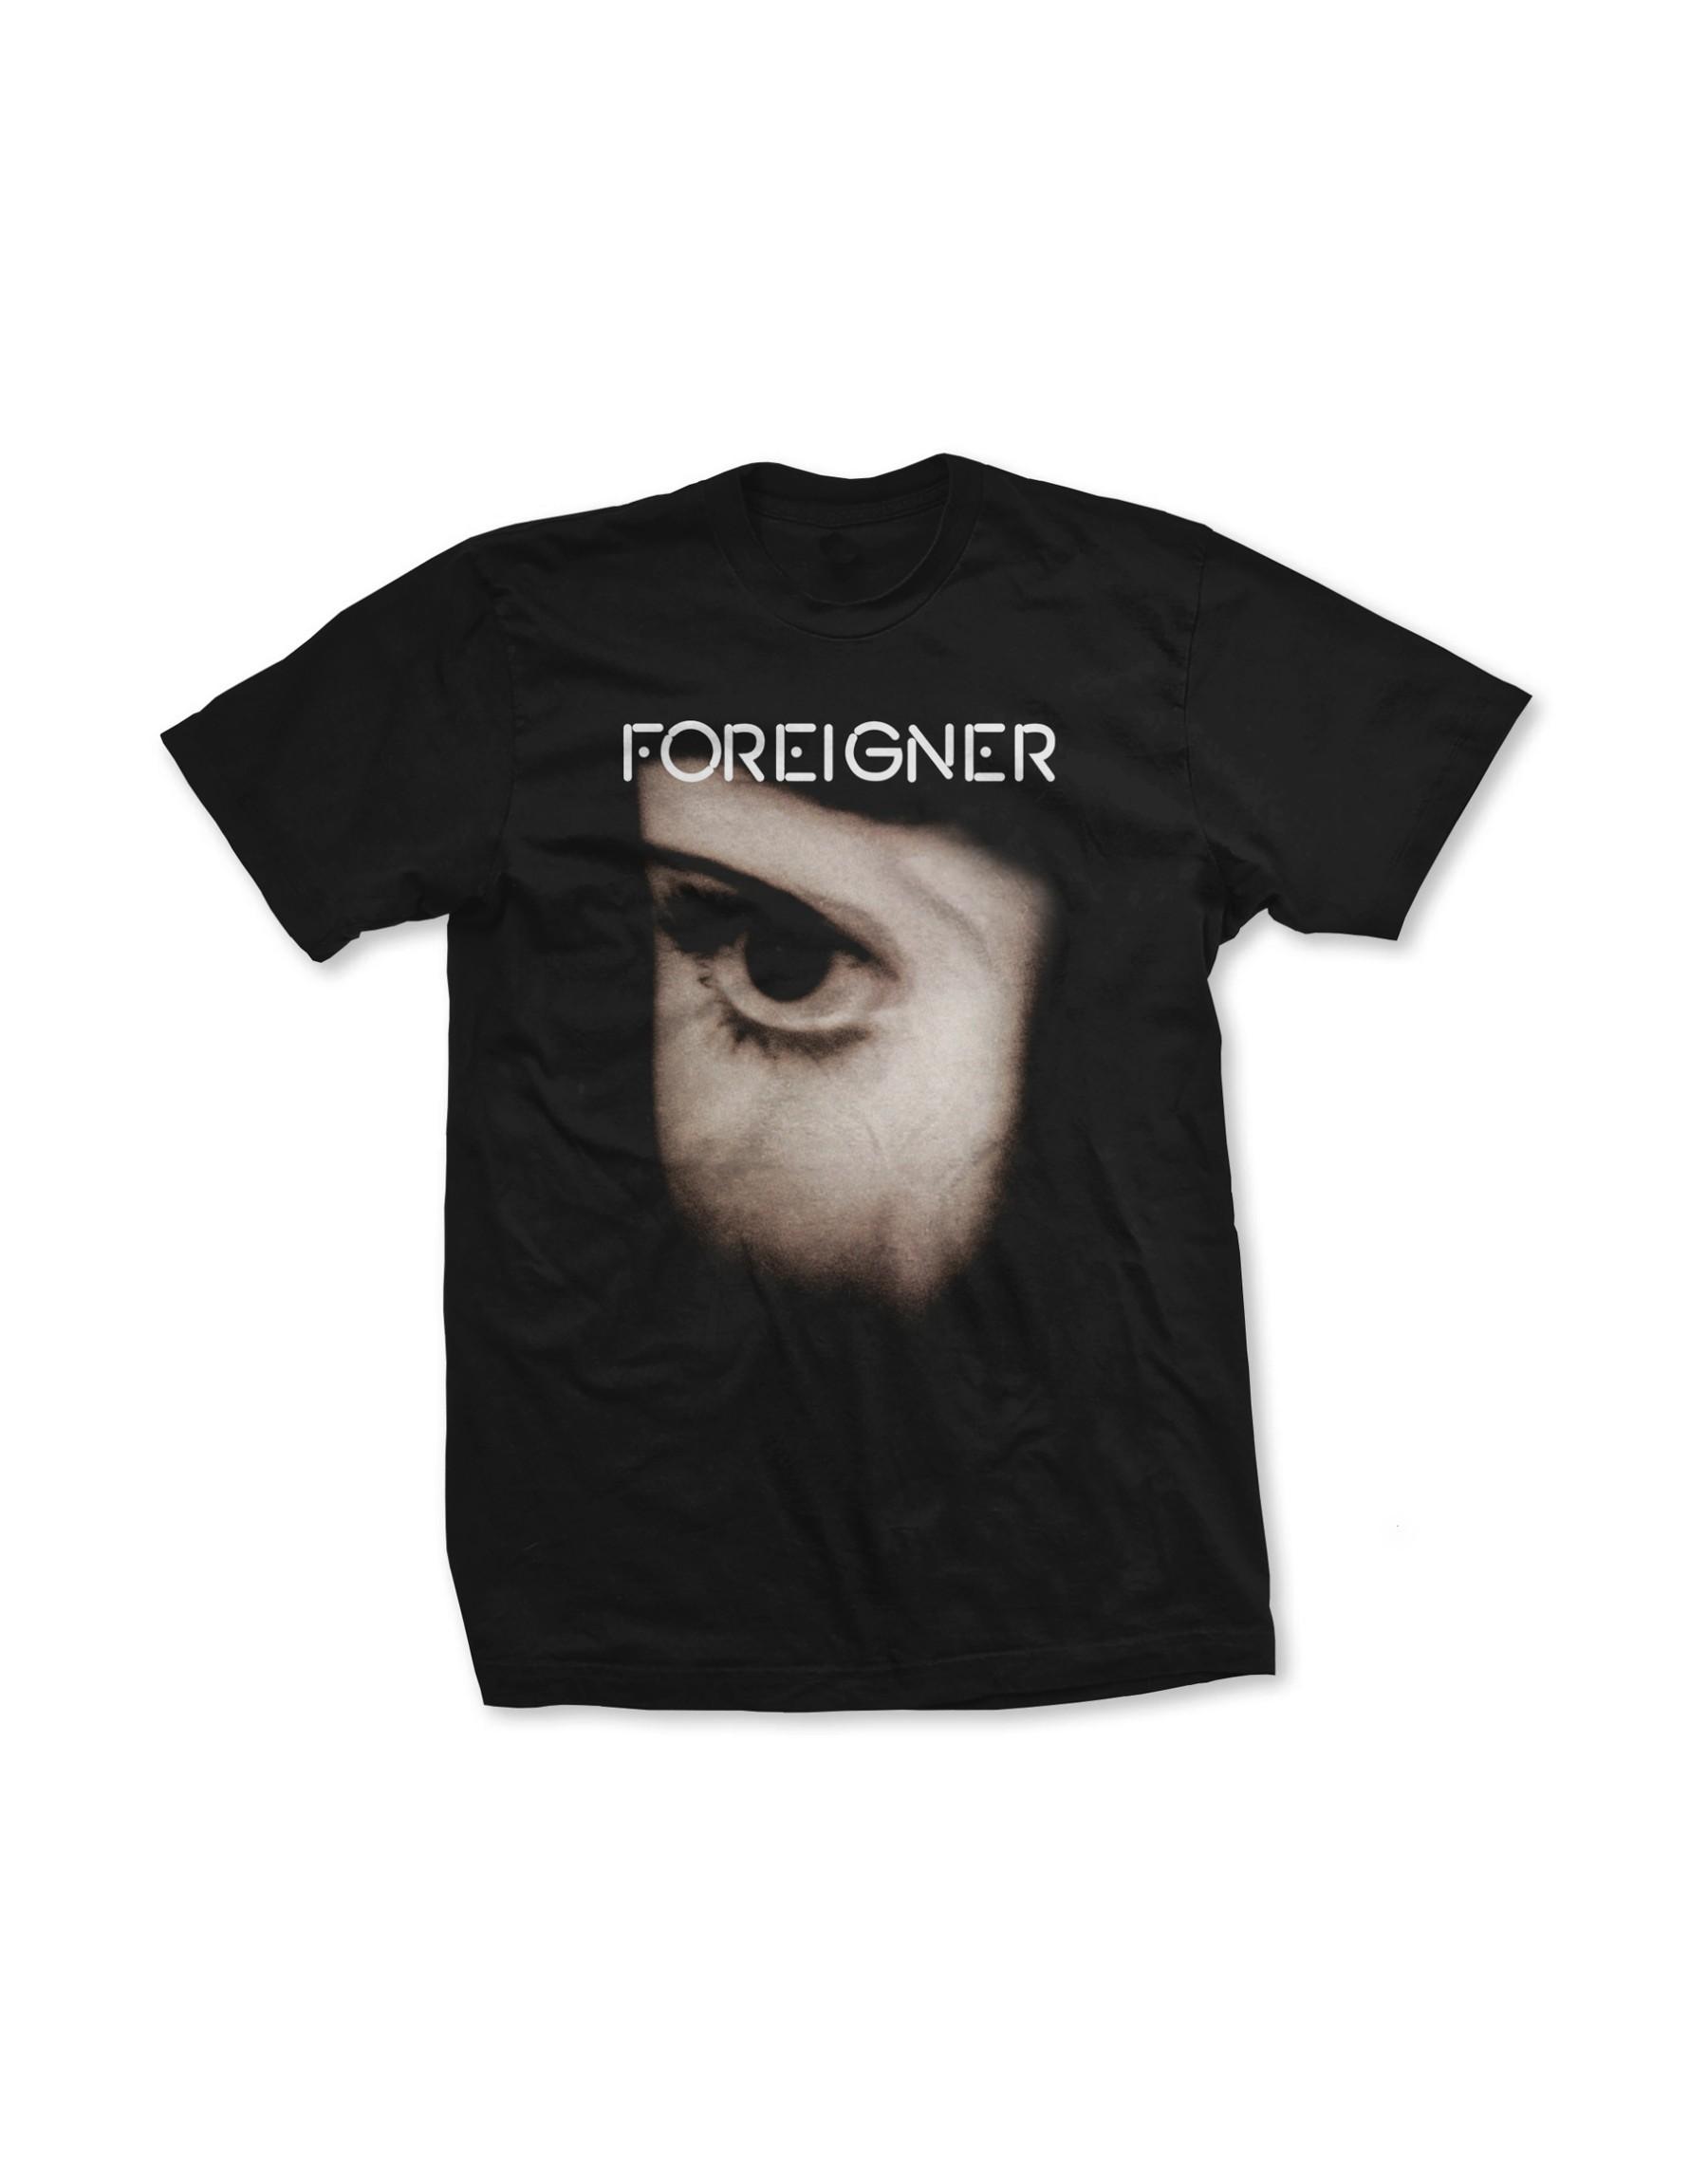 Foreigner Boys Inside Information T-Shirt